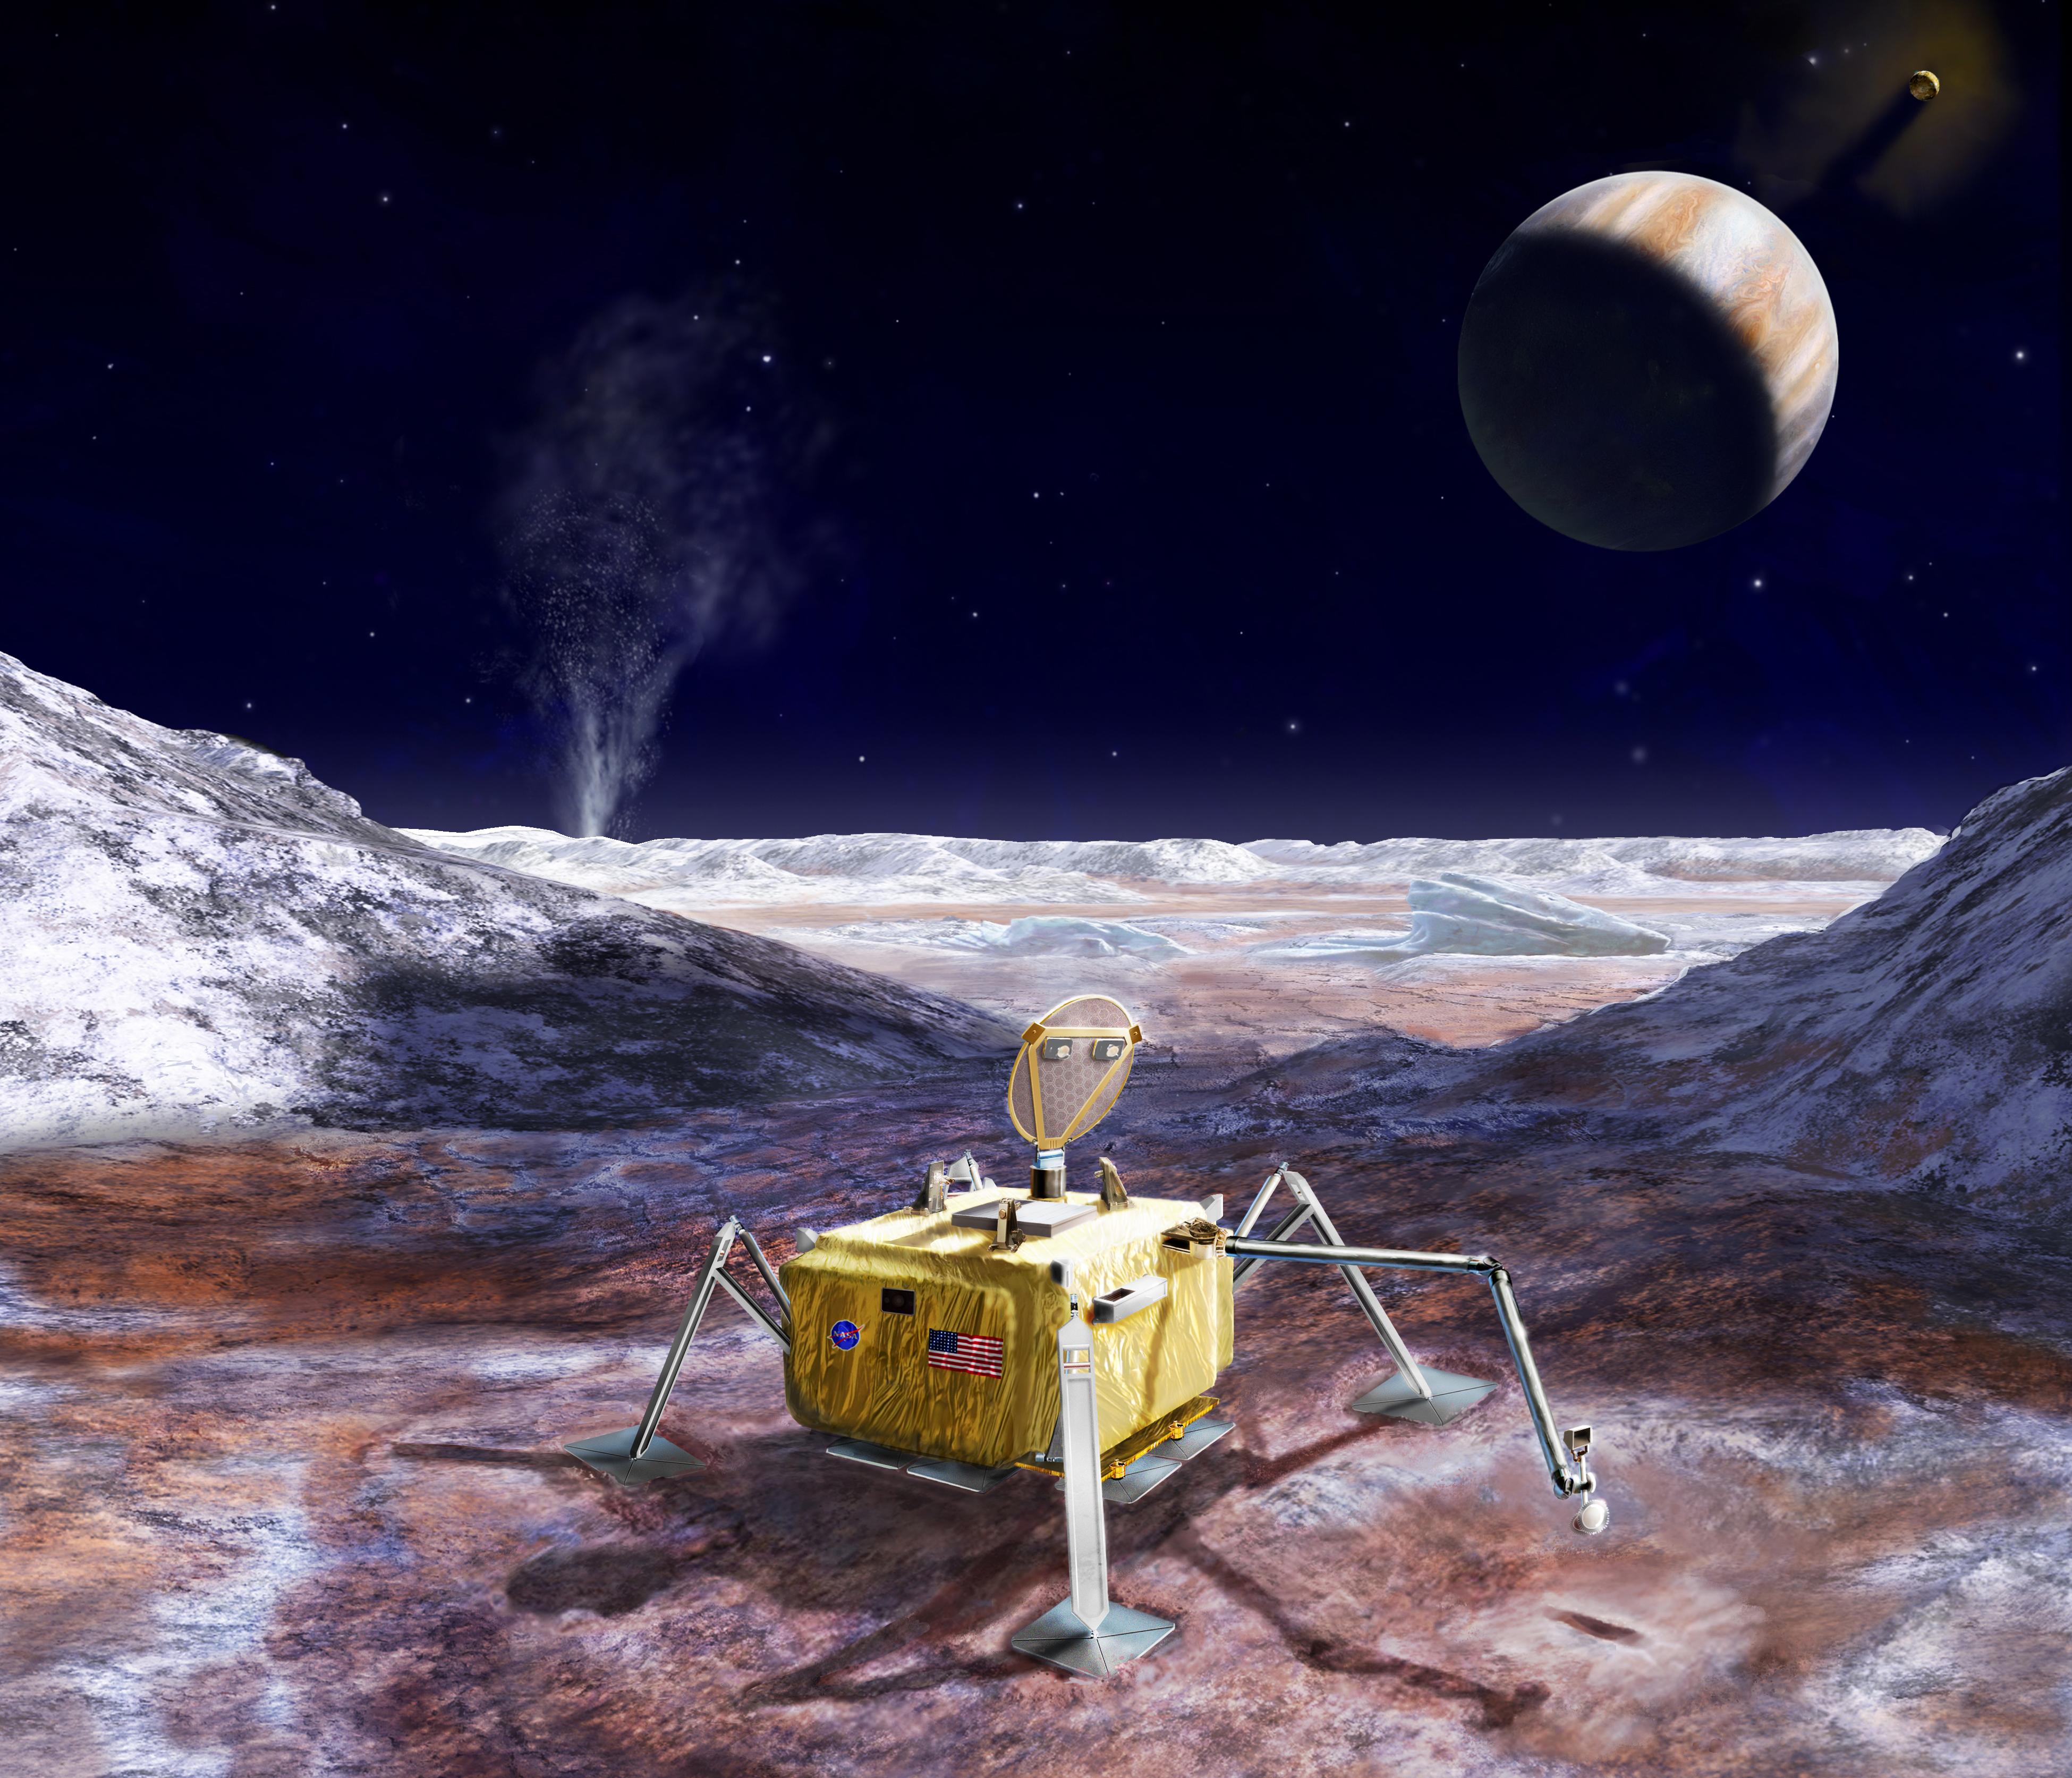 Illustration of a conceptual lander for Jupiter's moon Europa